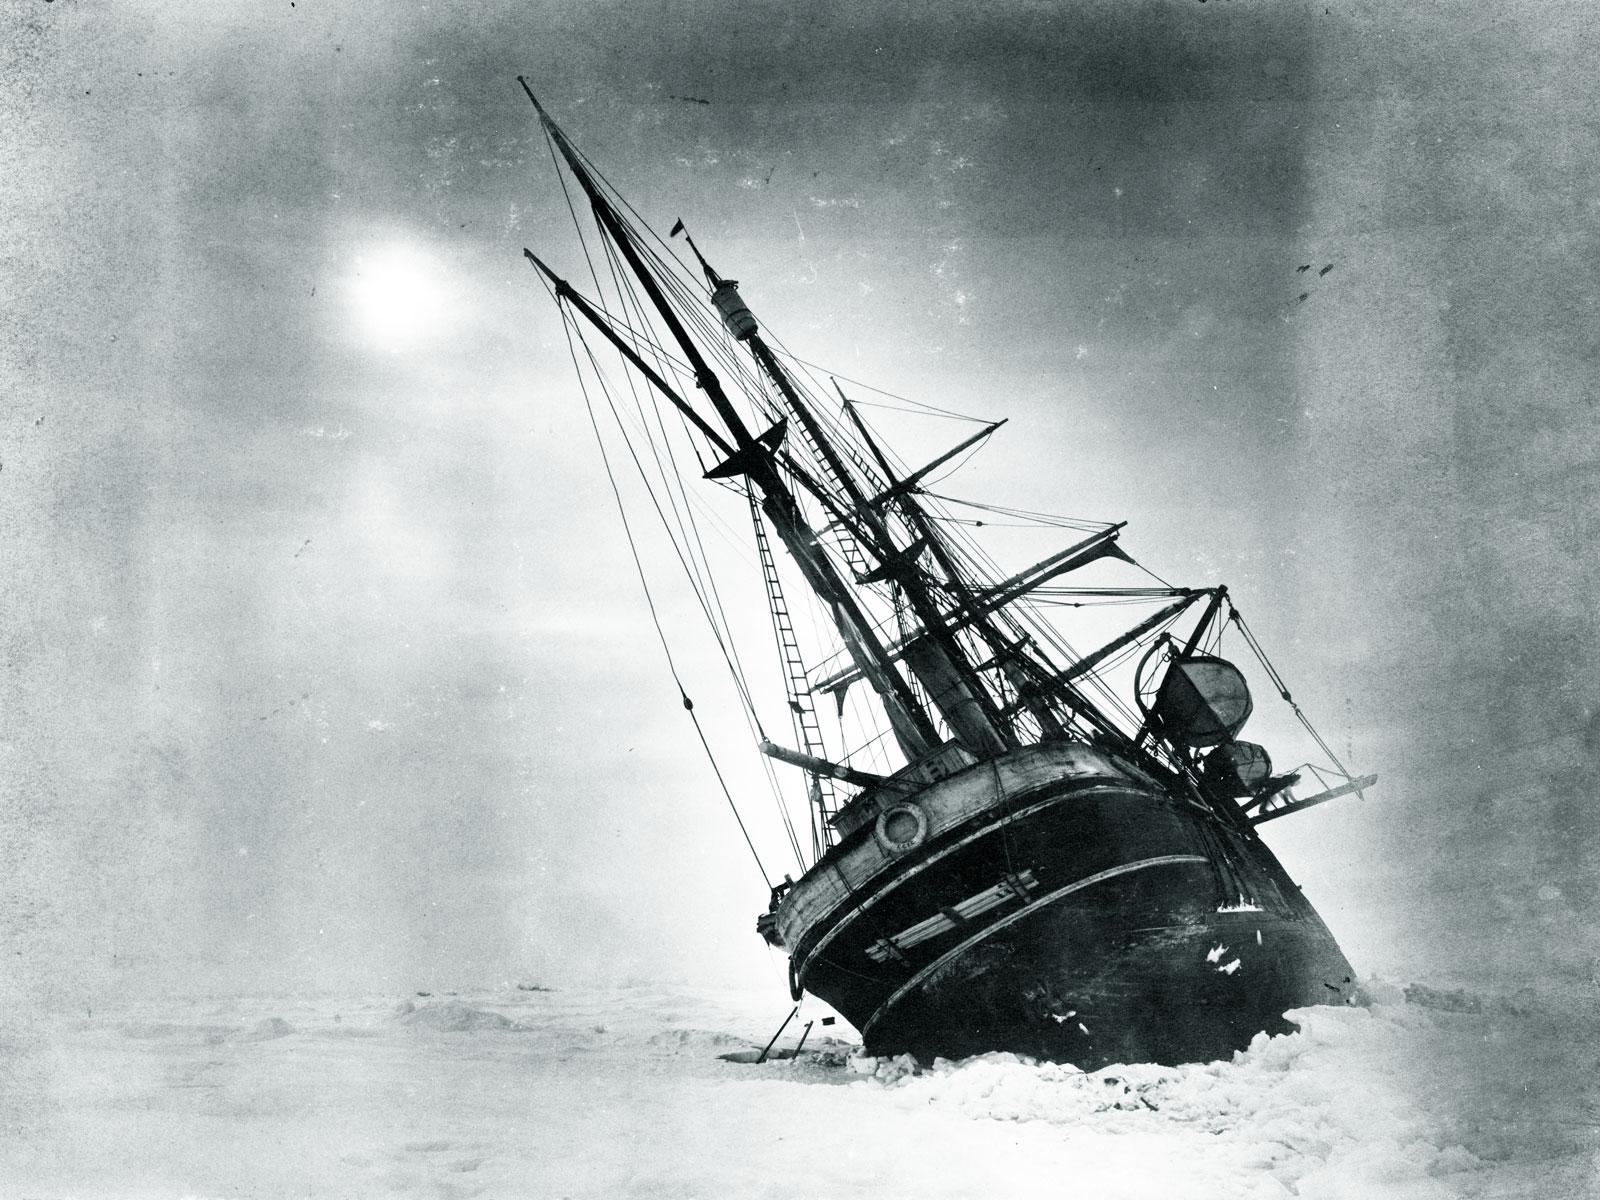 shackletons lost ship endurance - HD1600×1200